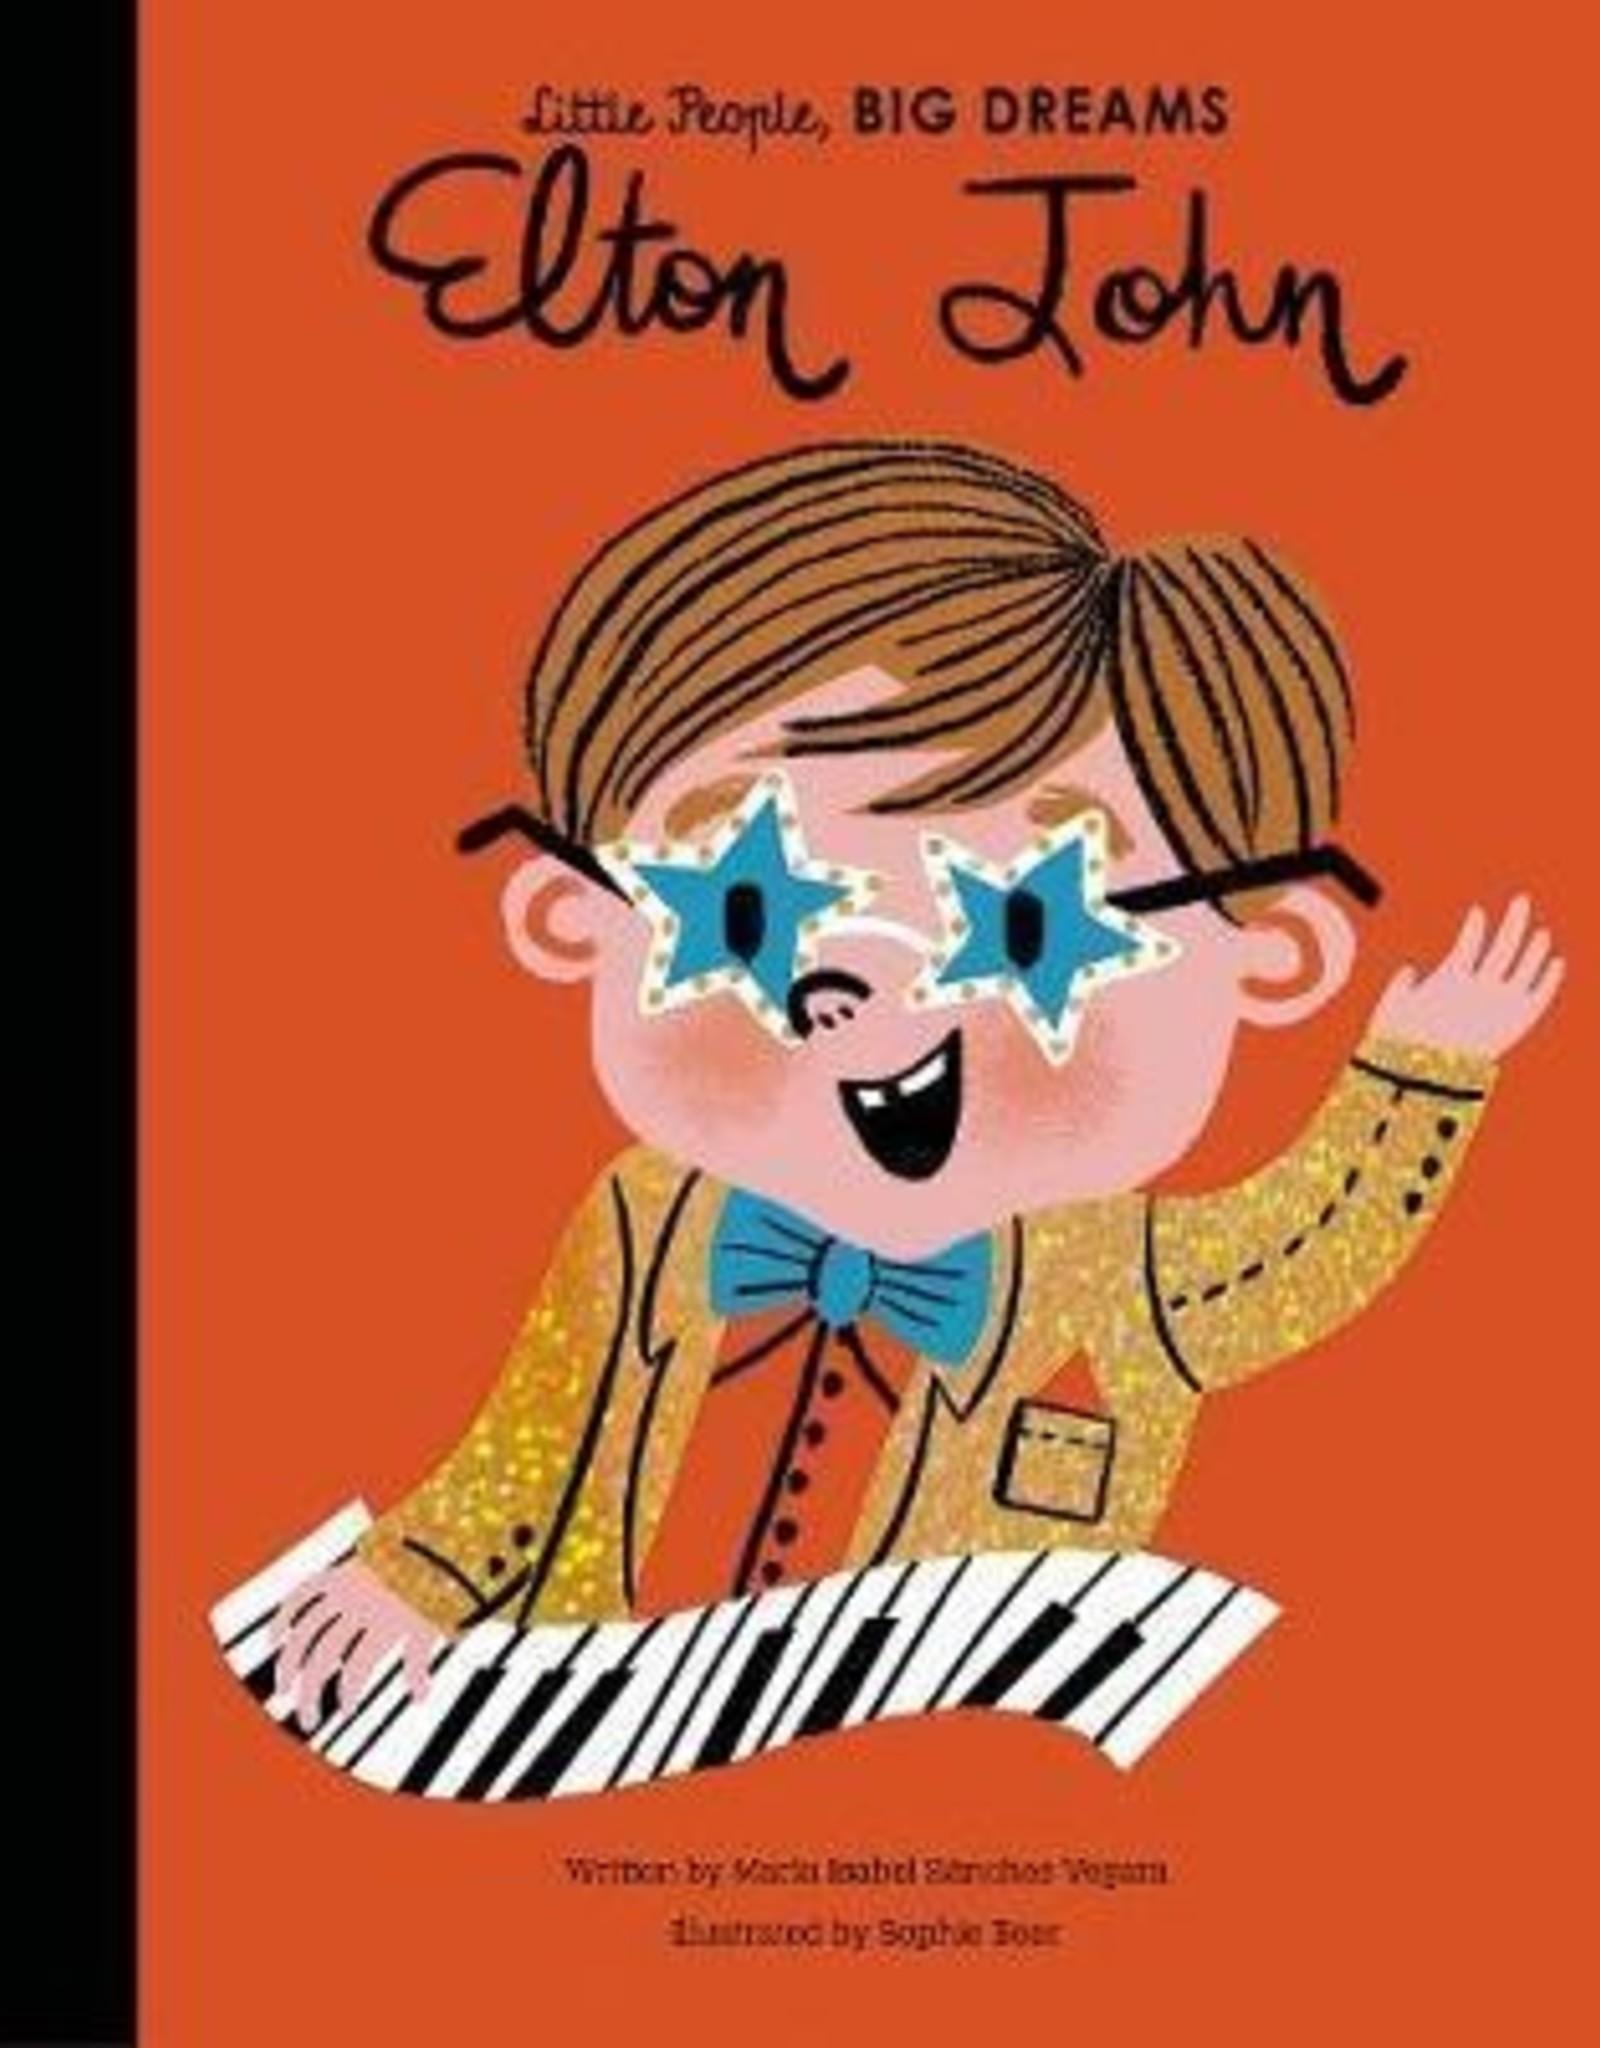 Frances Lincoln Elton John